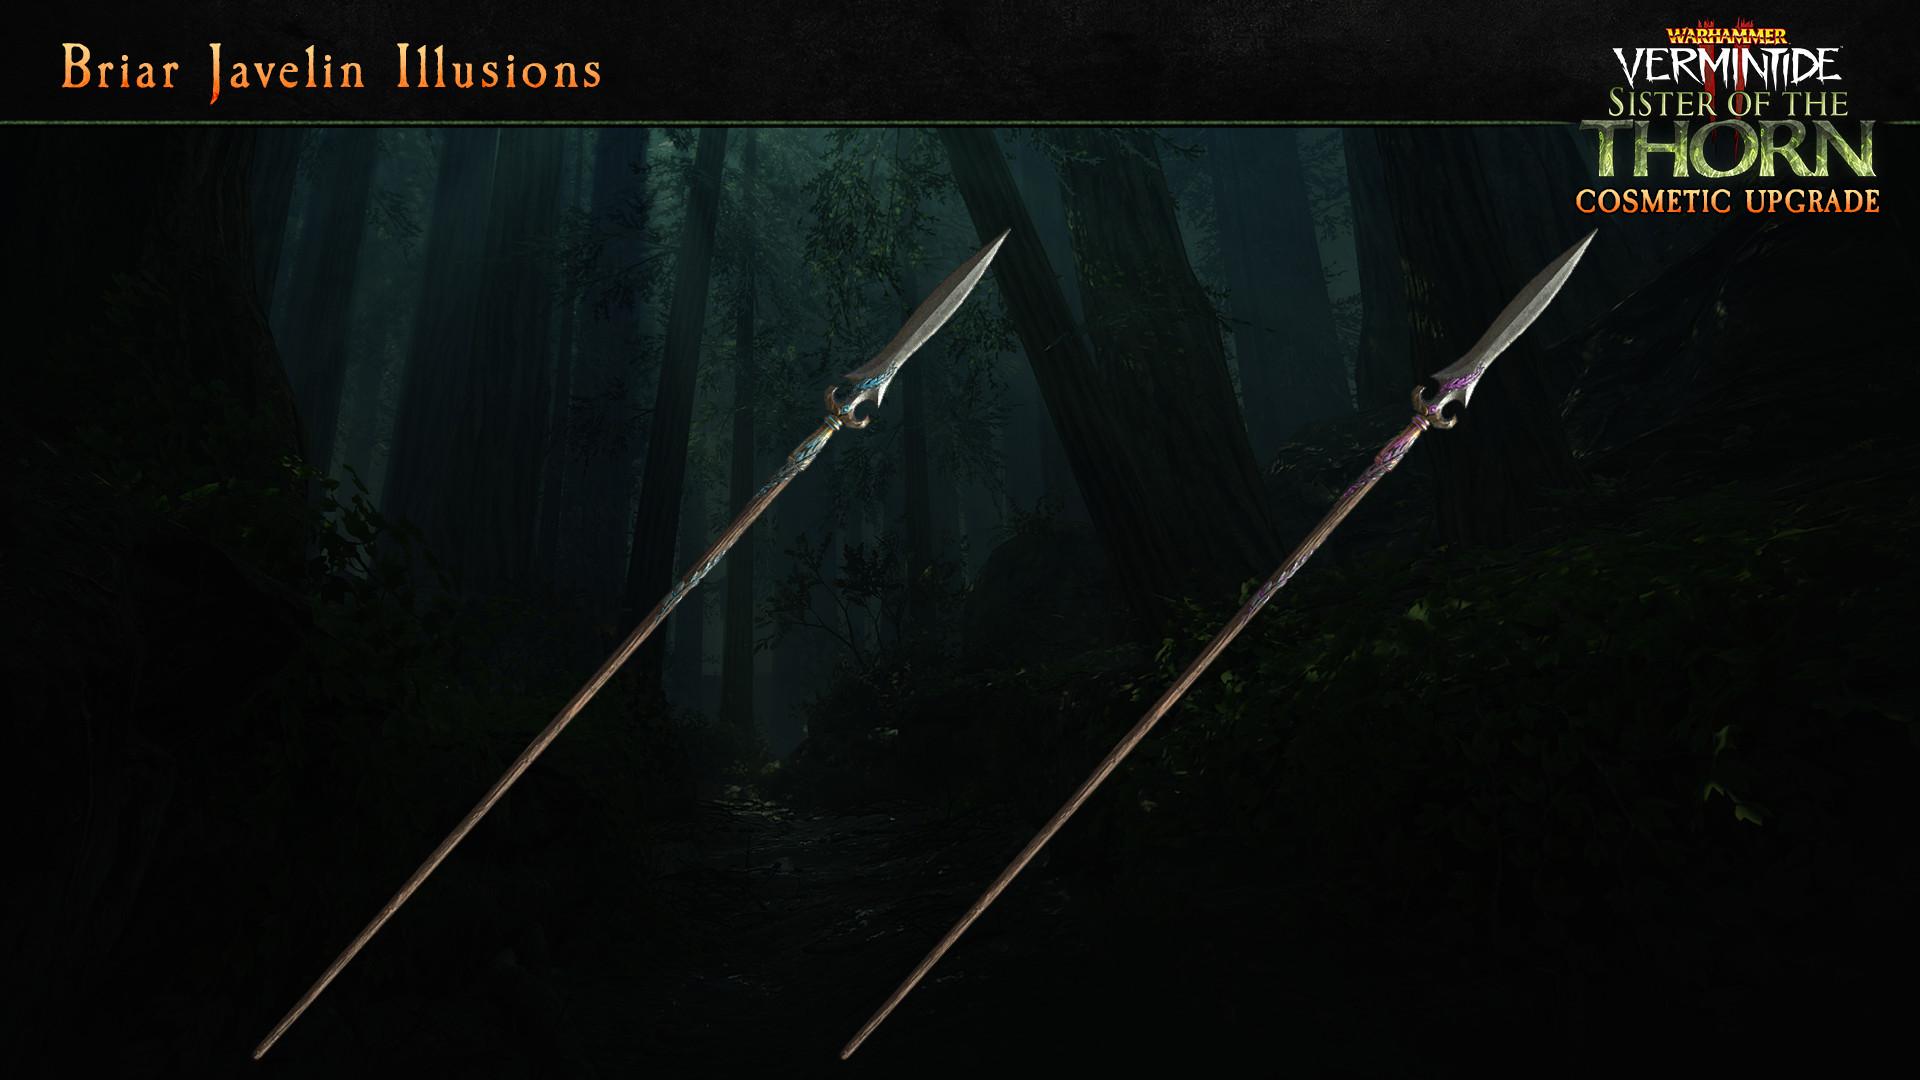 Warhammer: Vermintide 2 - Sister of the Thorn Cosmetic Upgrade Fiyat Karşılaştırma